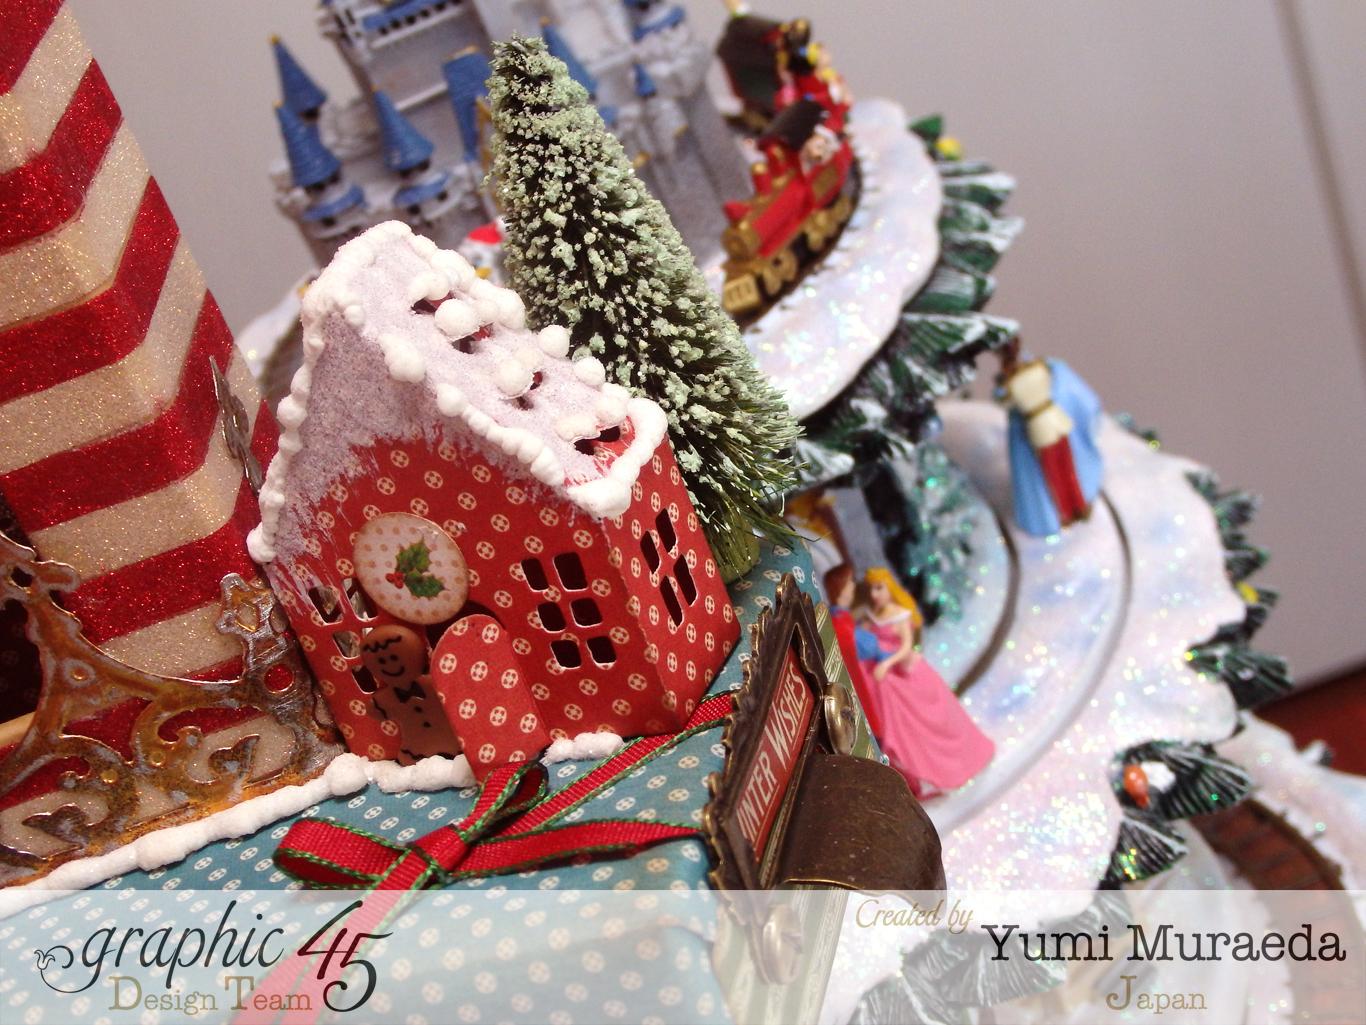 yuyu3christmaskeyholderhouse6.jpg